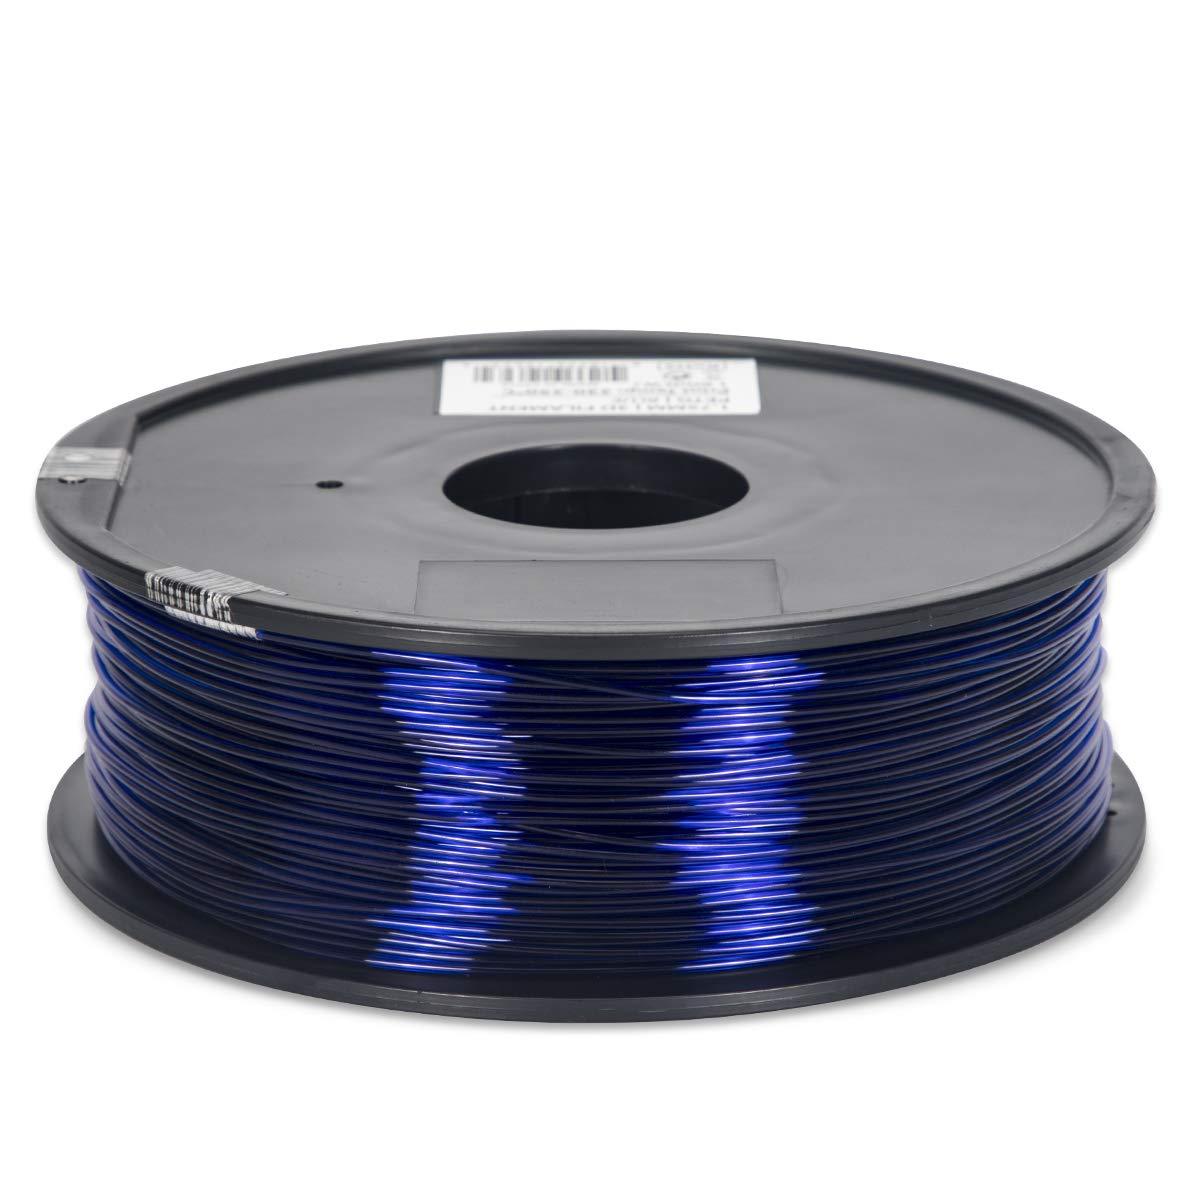 PETG Filament - 1.75 -  Blue Translucent - Inland